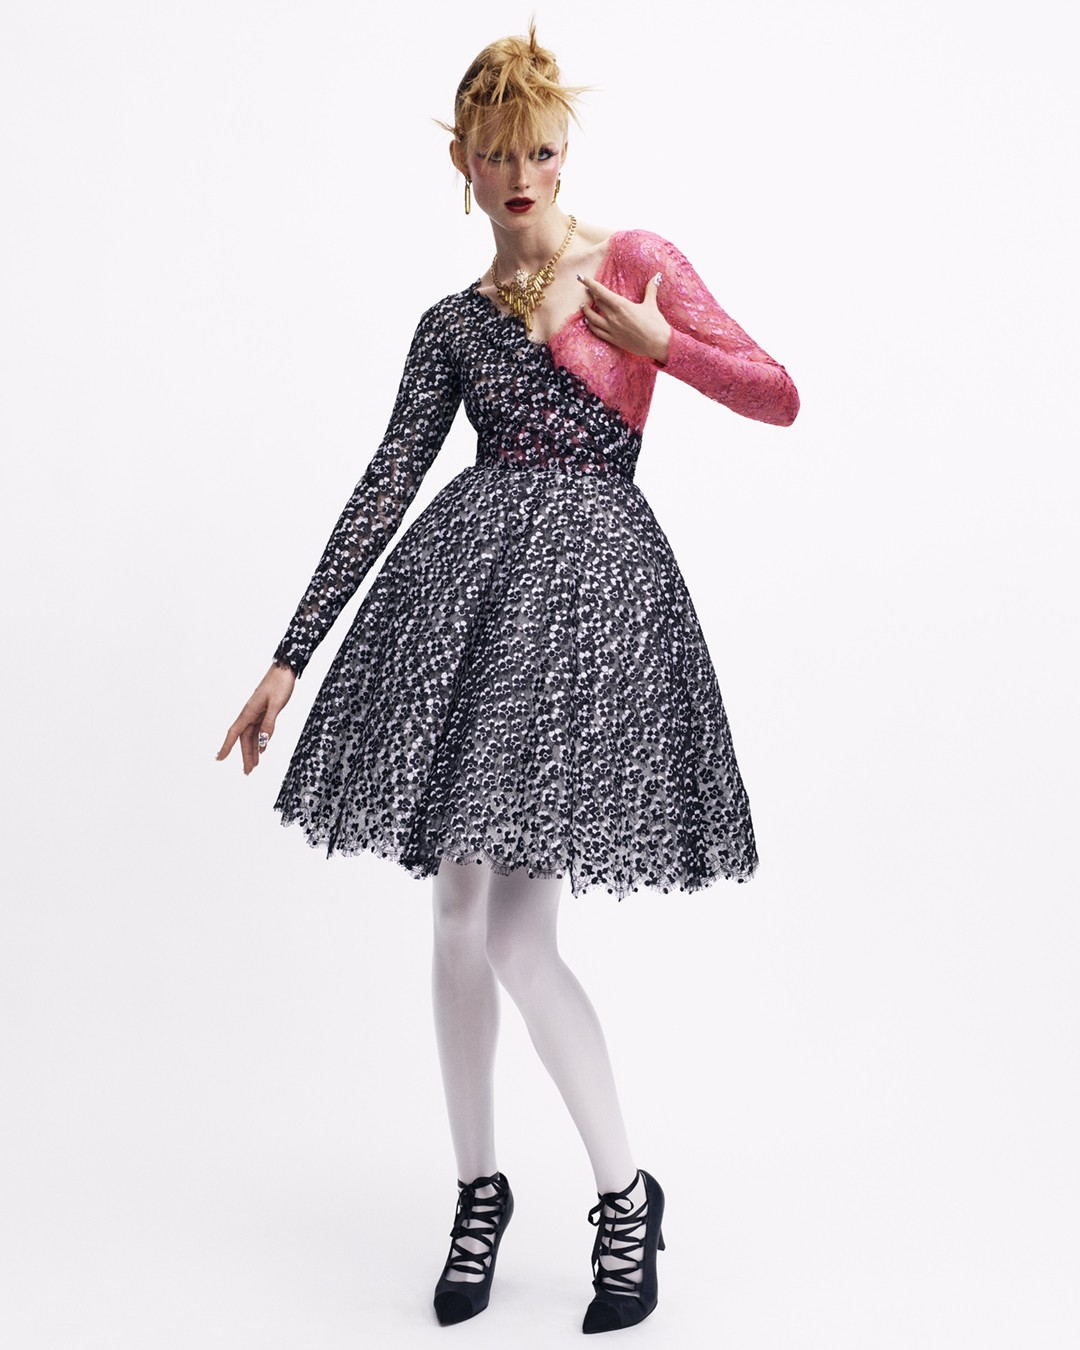 H Haute Couture συλλογή του οίκου Chanel είχε punk διάθεση